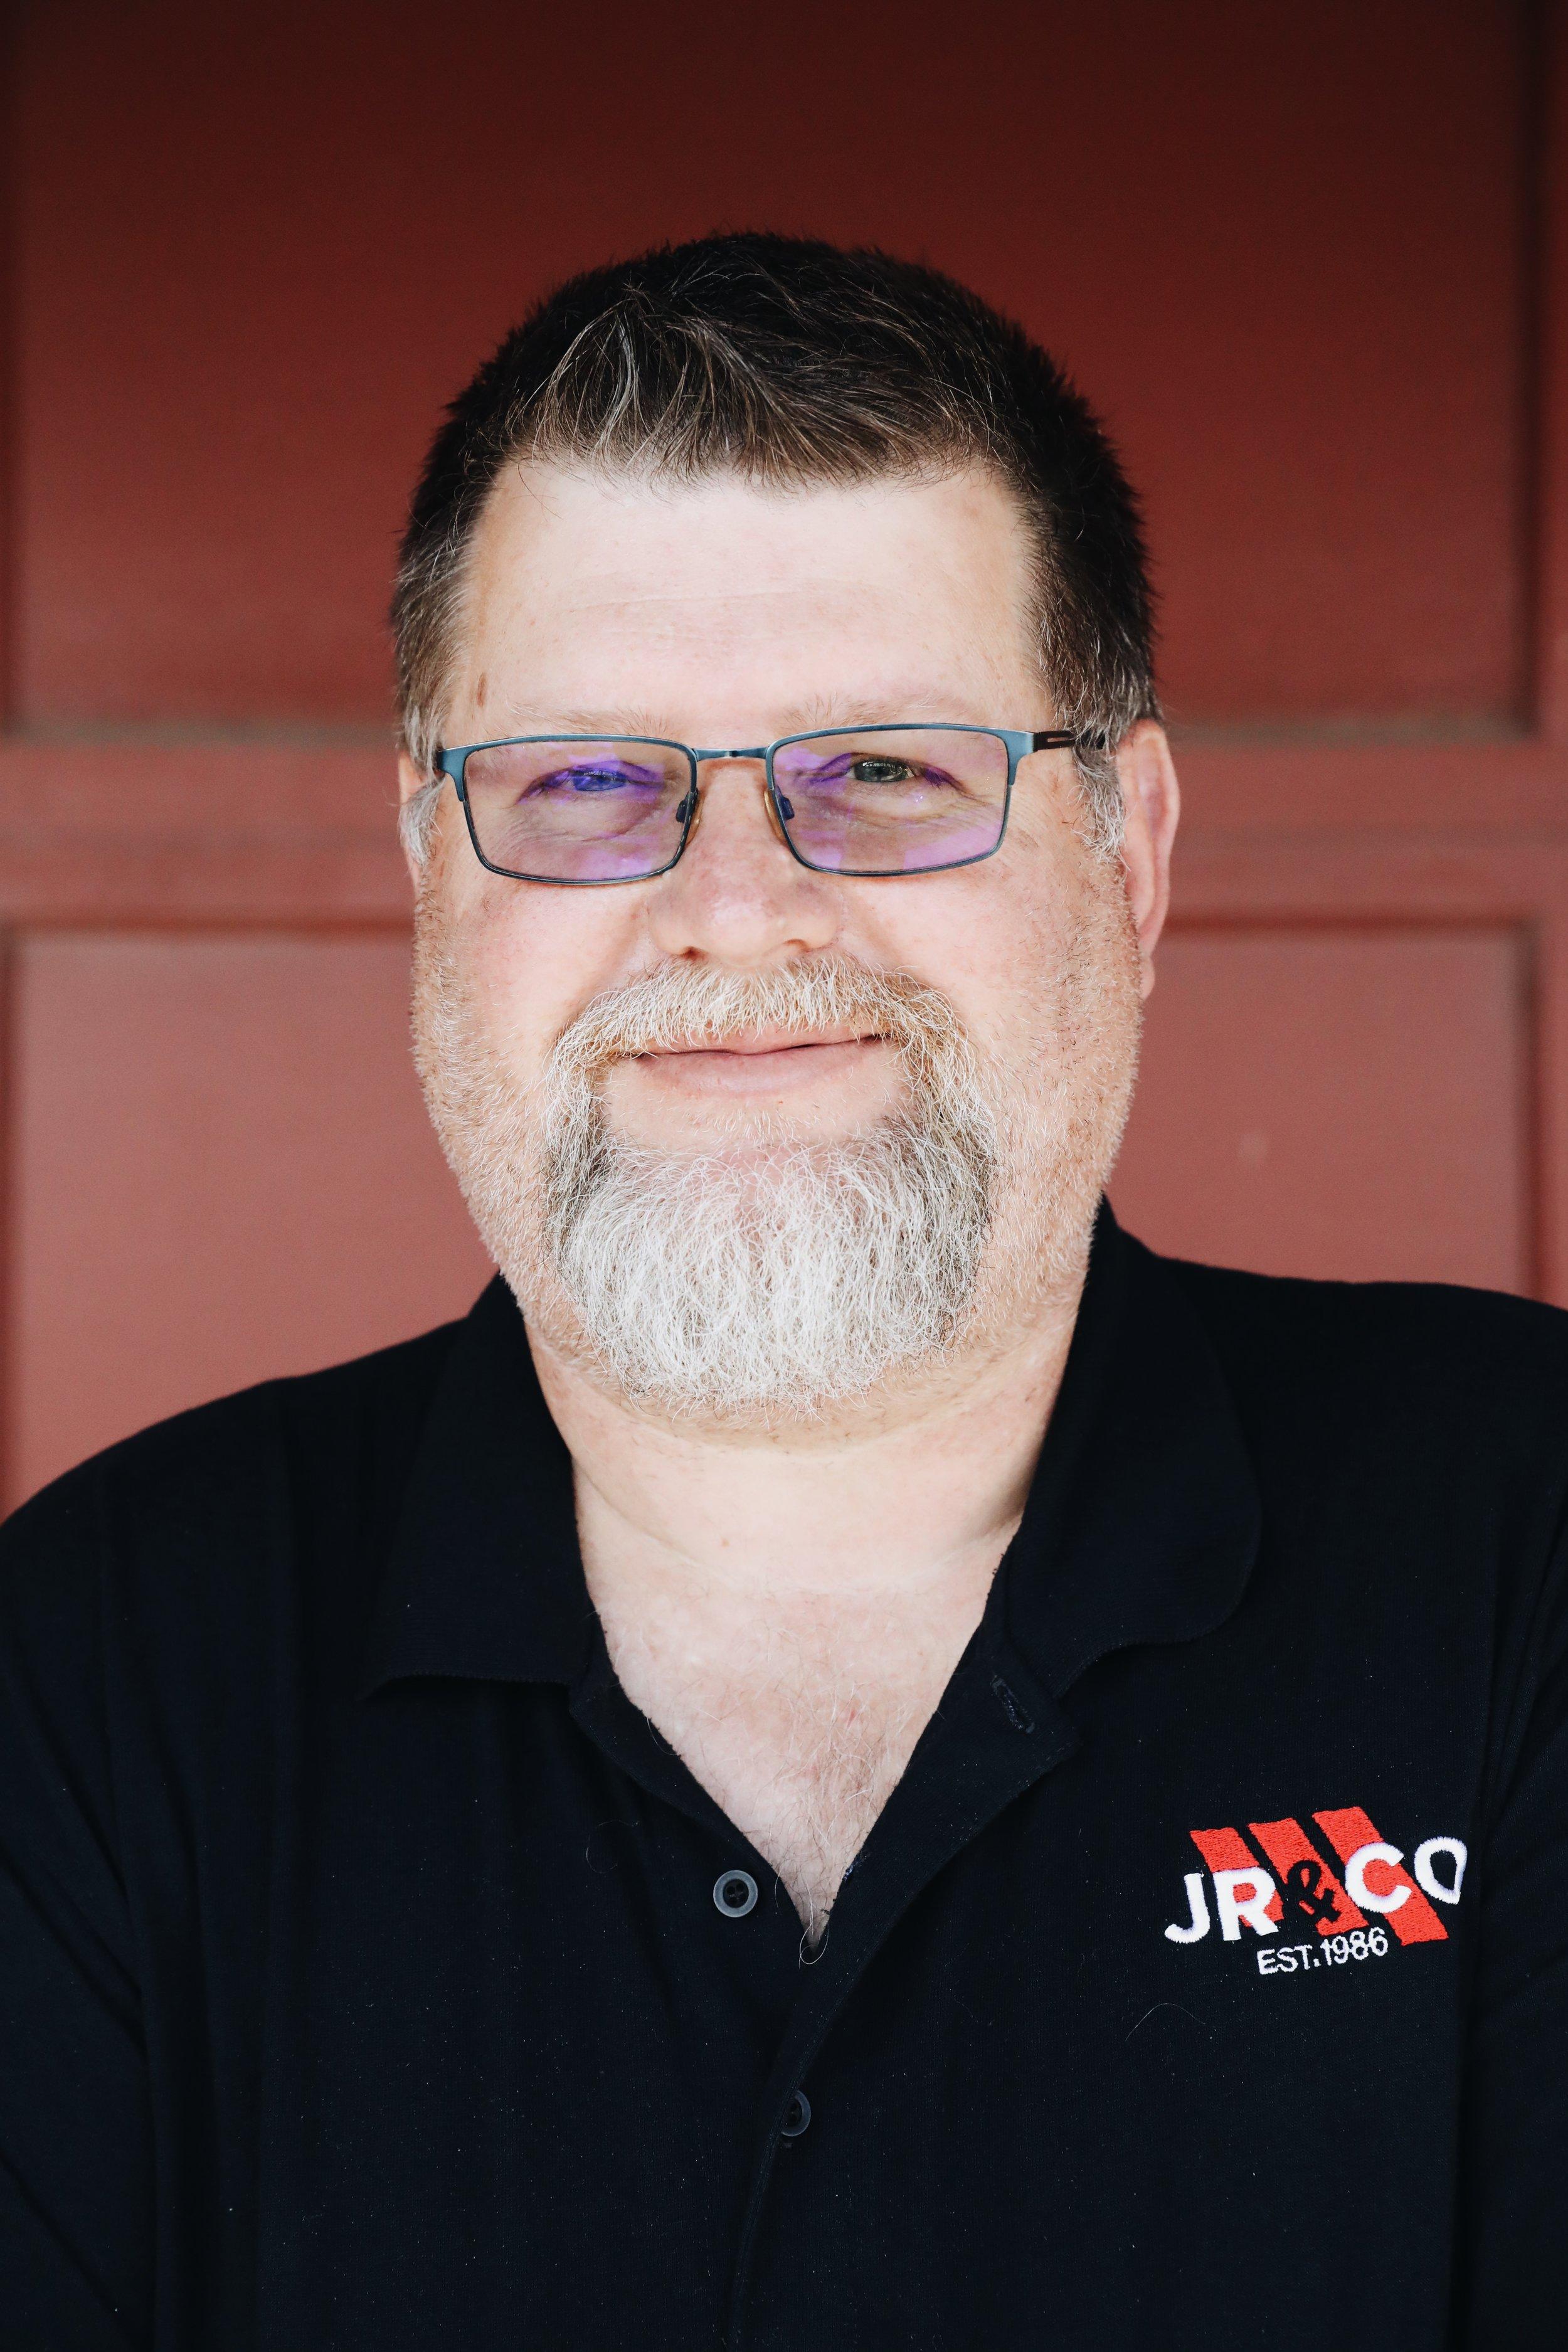 Ed Edgar - Director of IT